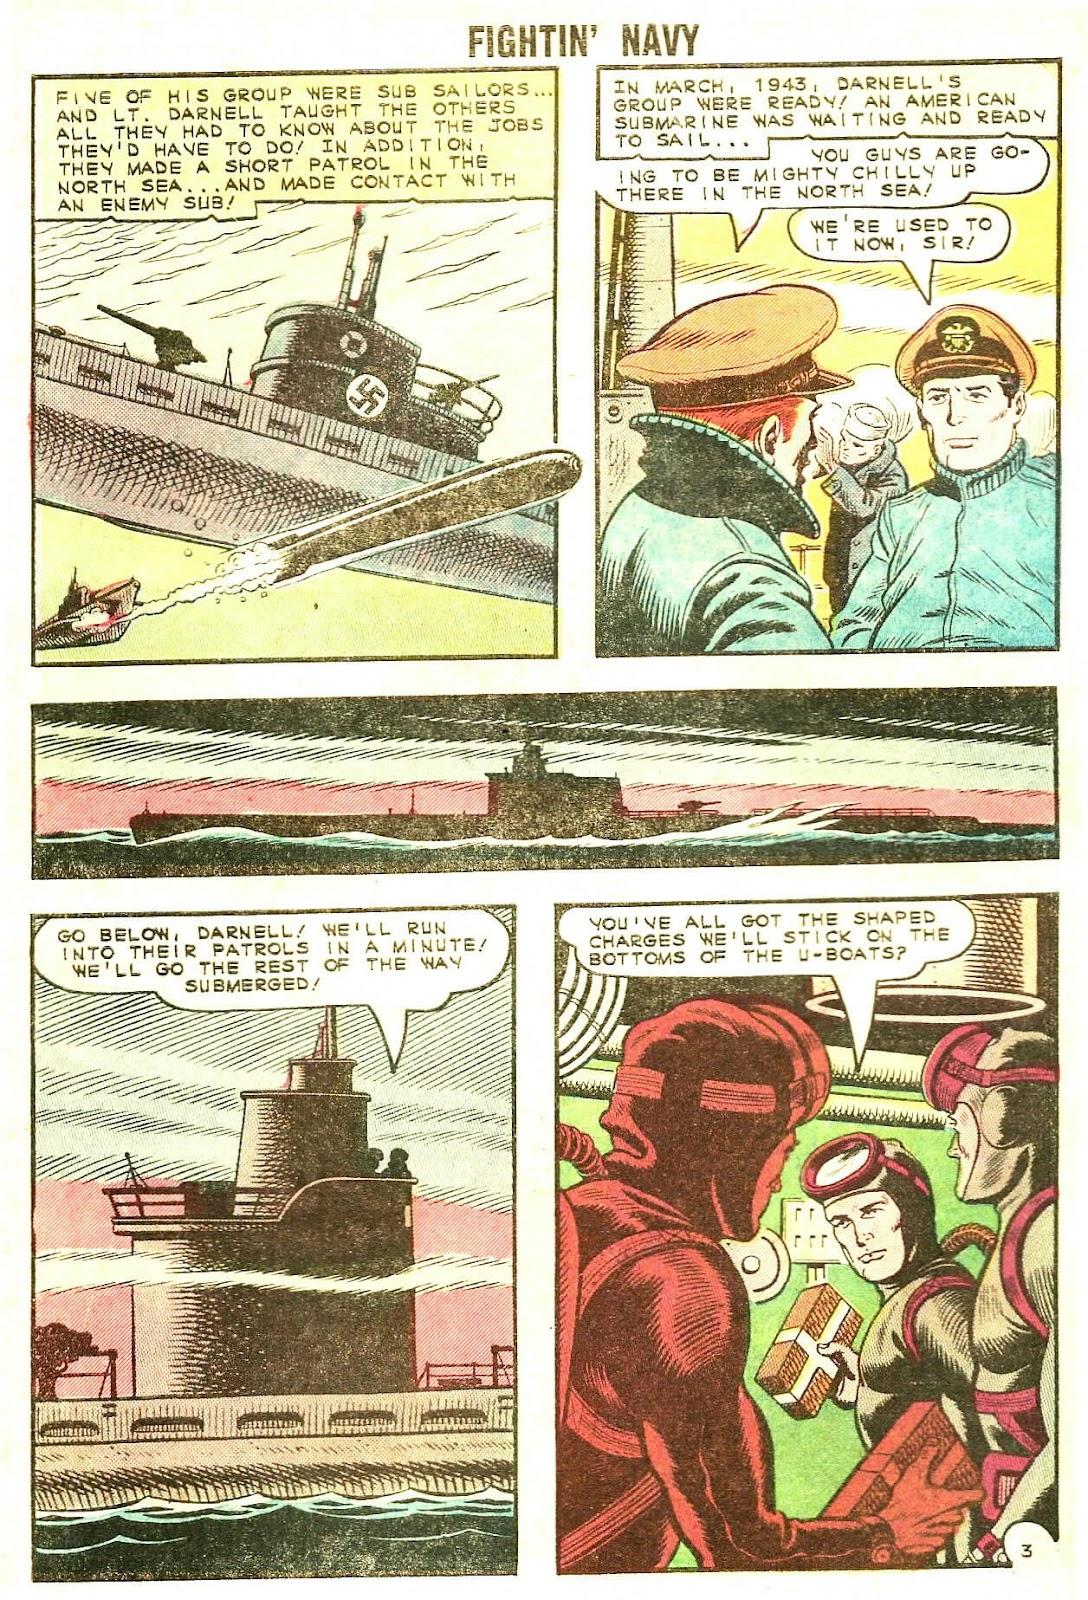 Read online Fightin' Navy comic -  Issue #120 - 28